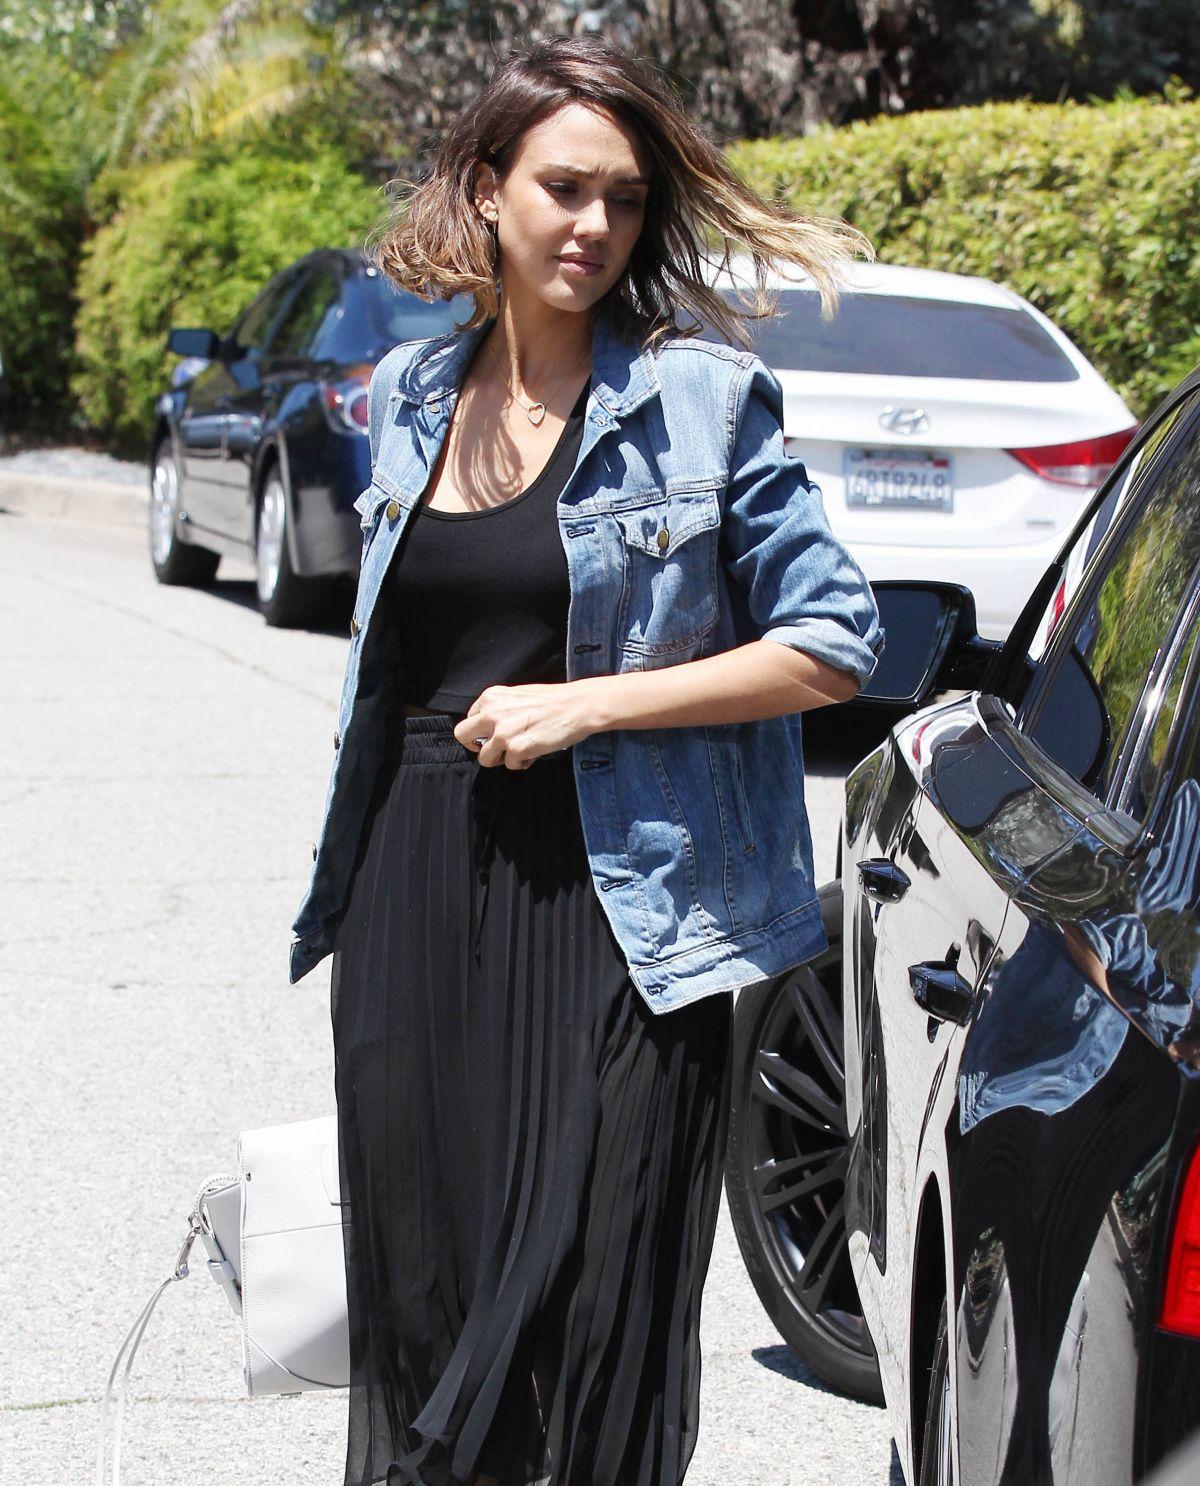 JESSICA ALBA Visits a Friend in Beverly Hills 06/14/2015